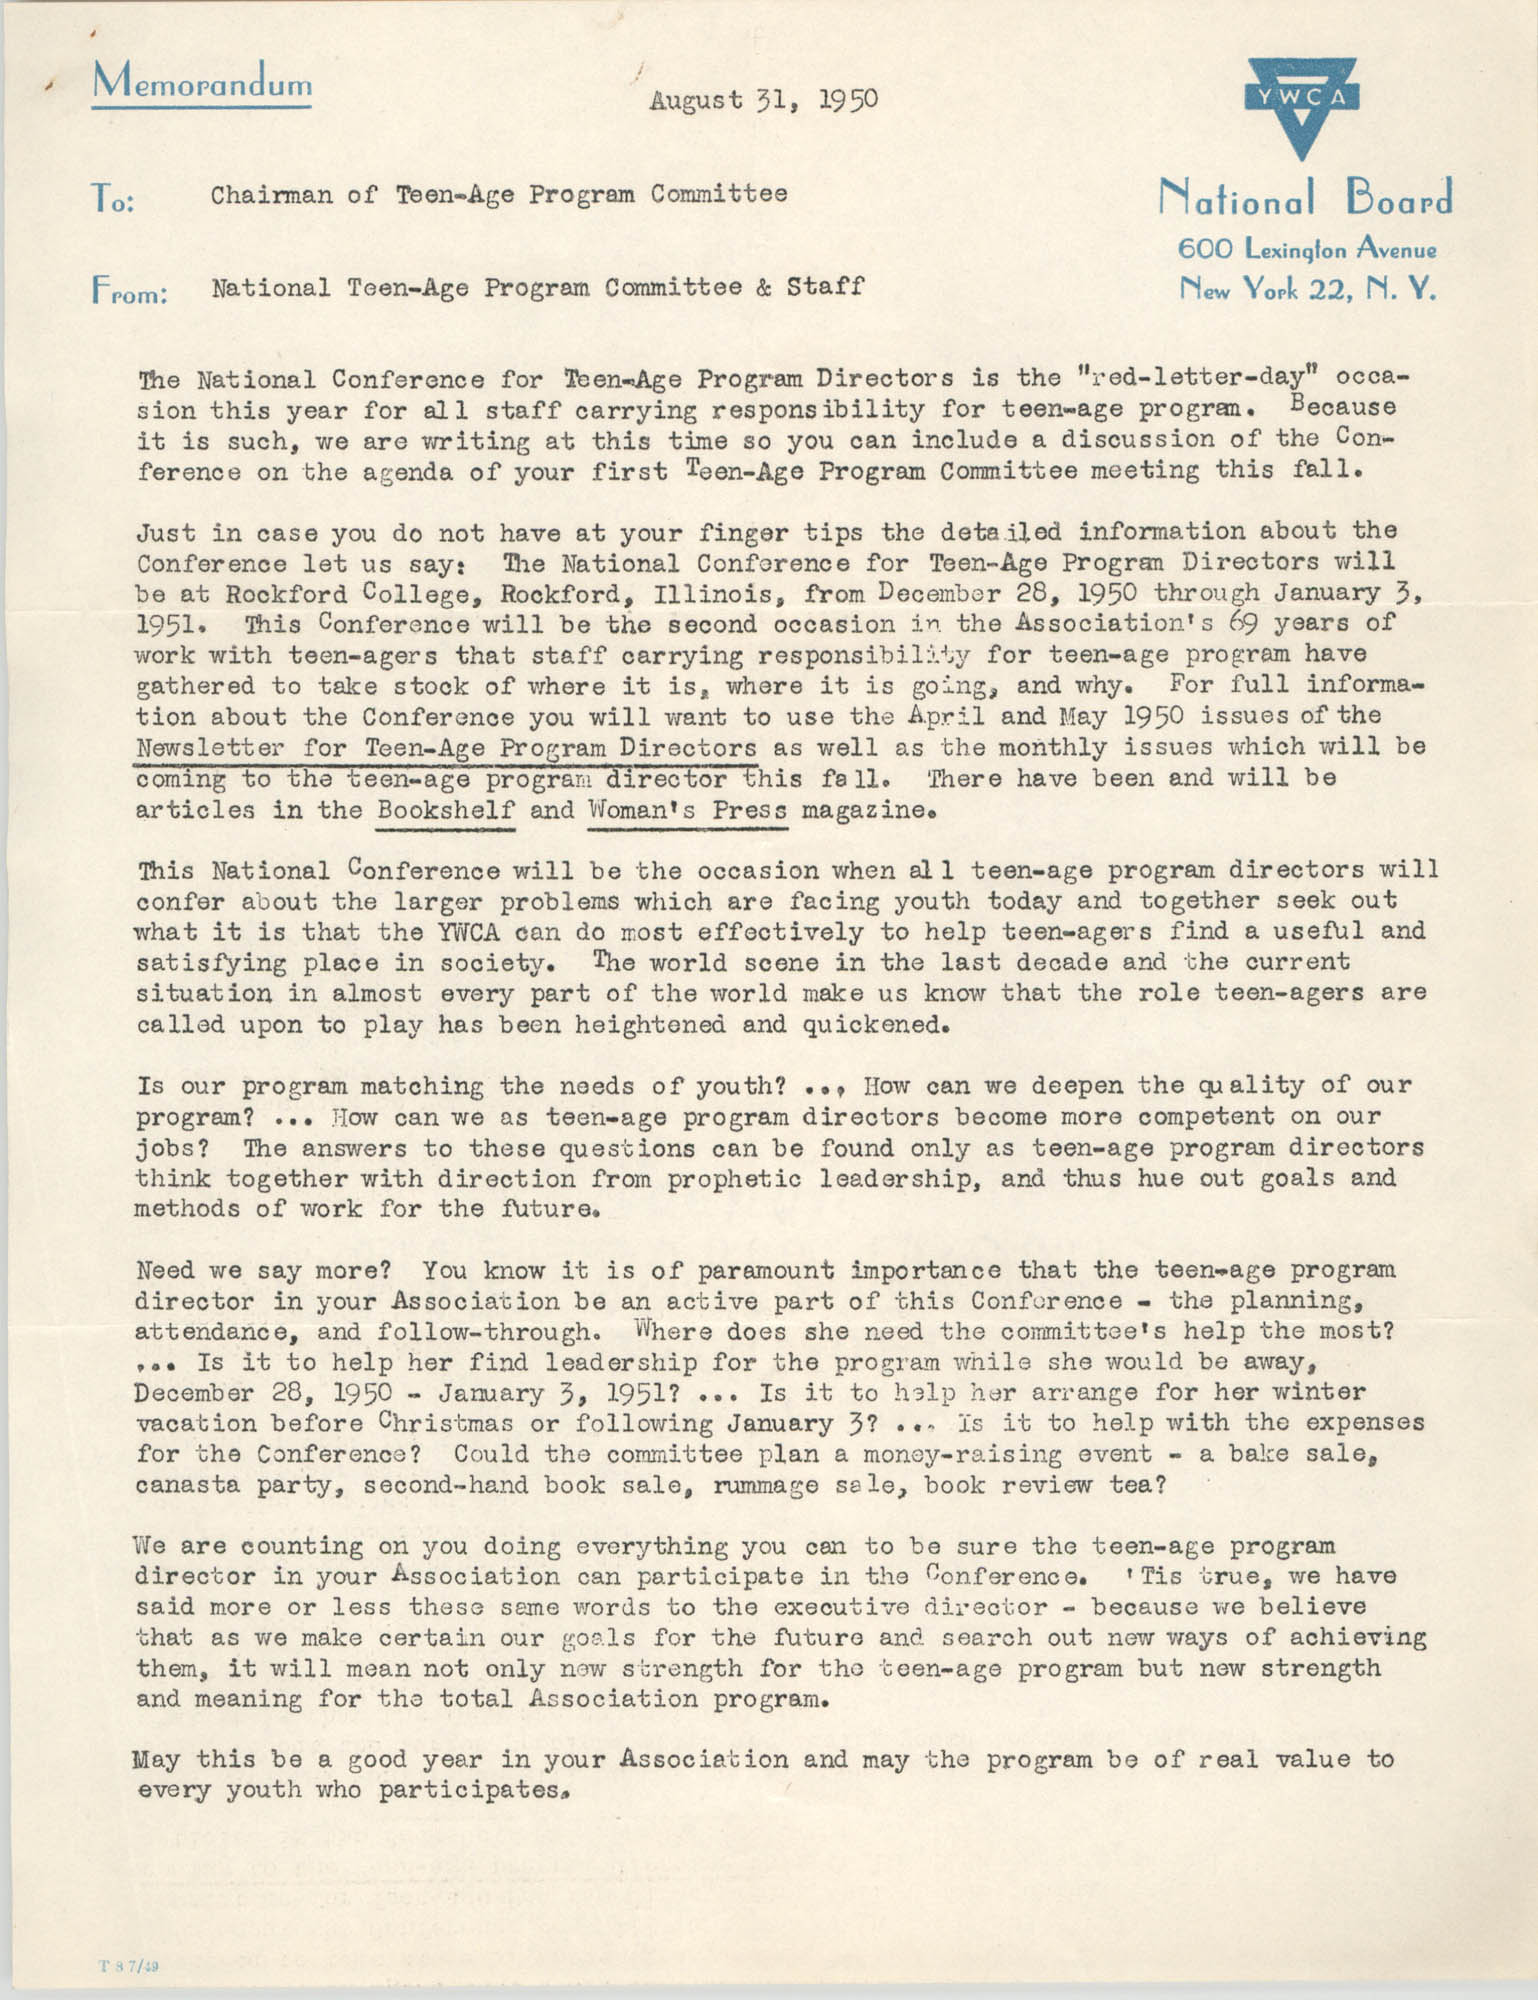 National Board of the Y.W.C.A. Memorandum, August 31, 1950